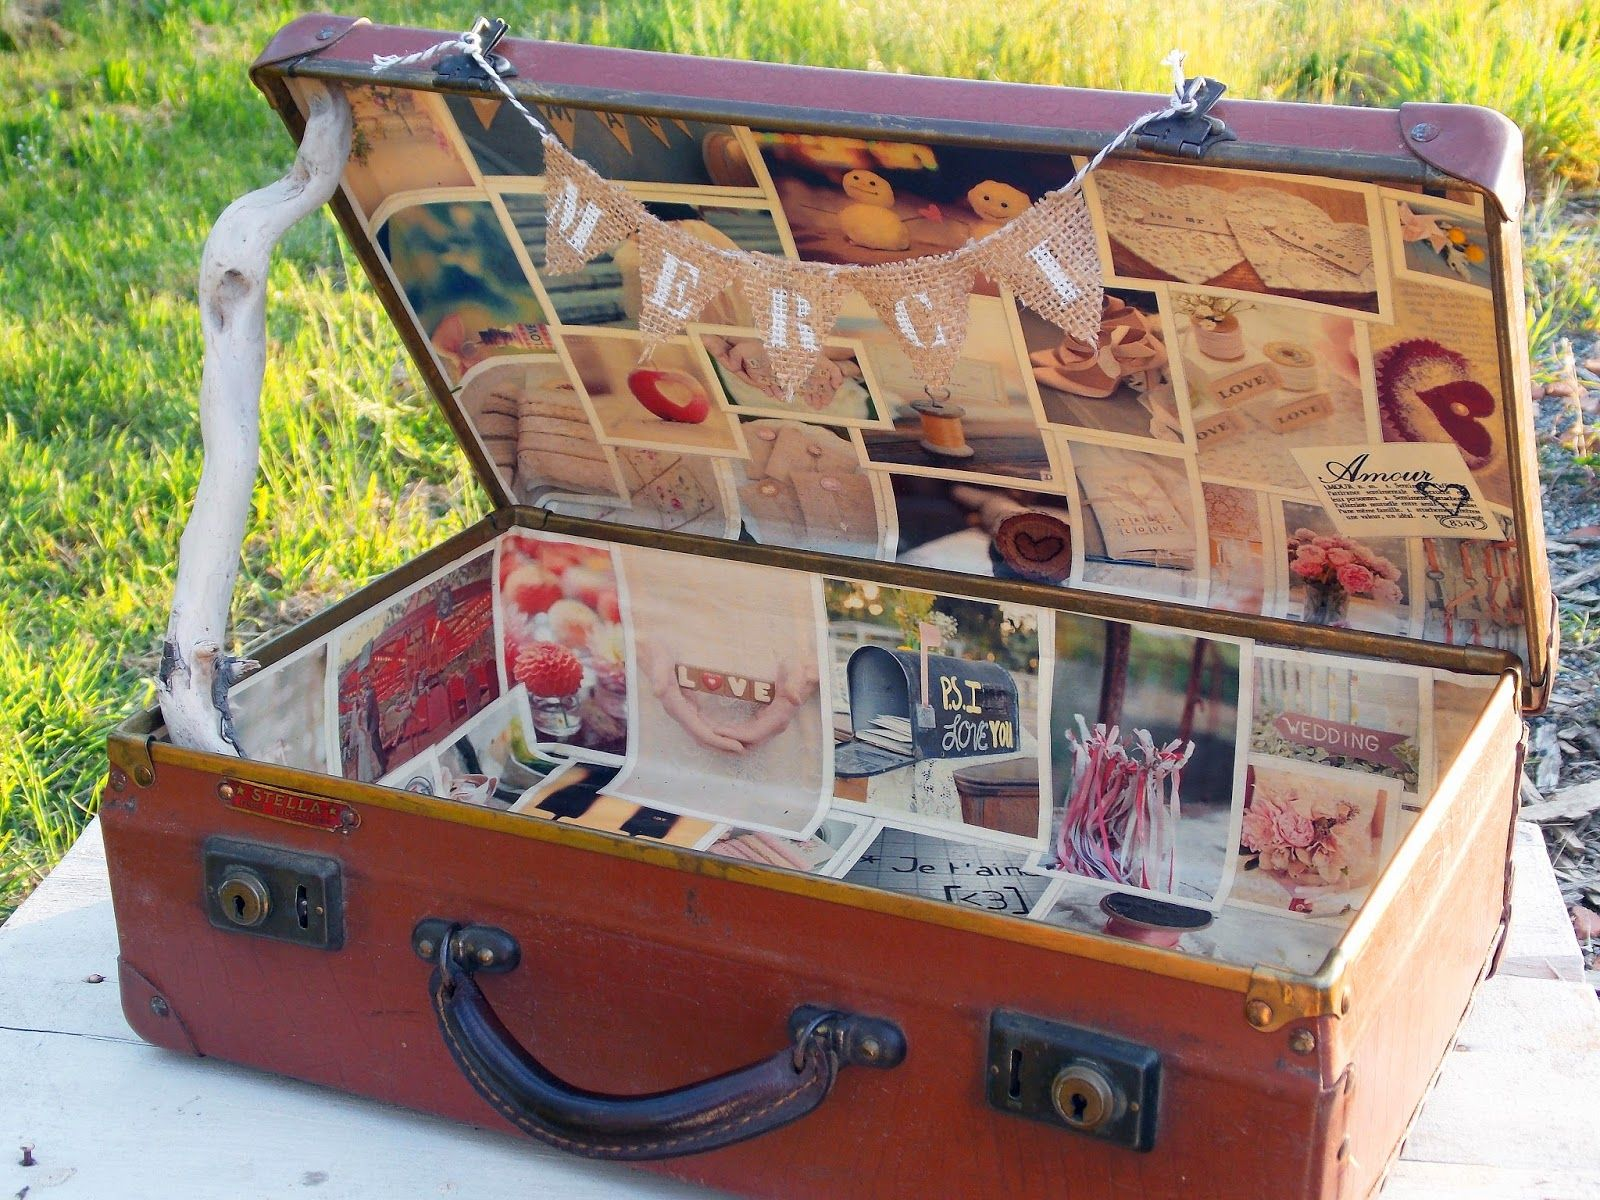 la f e kabosse urnes mariage valise caisse bois personnalis es mariage pinterest urne. Black Bedroom Furniture Sets. Home Design Ideas